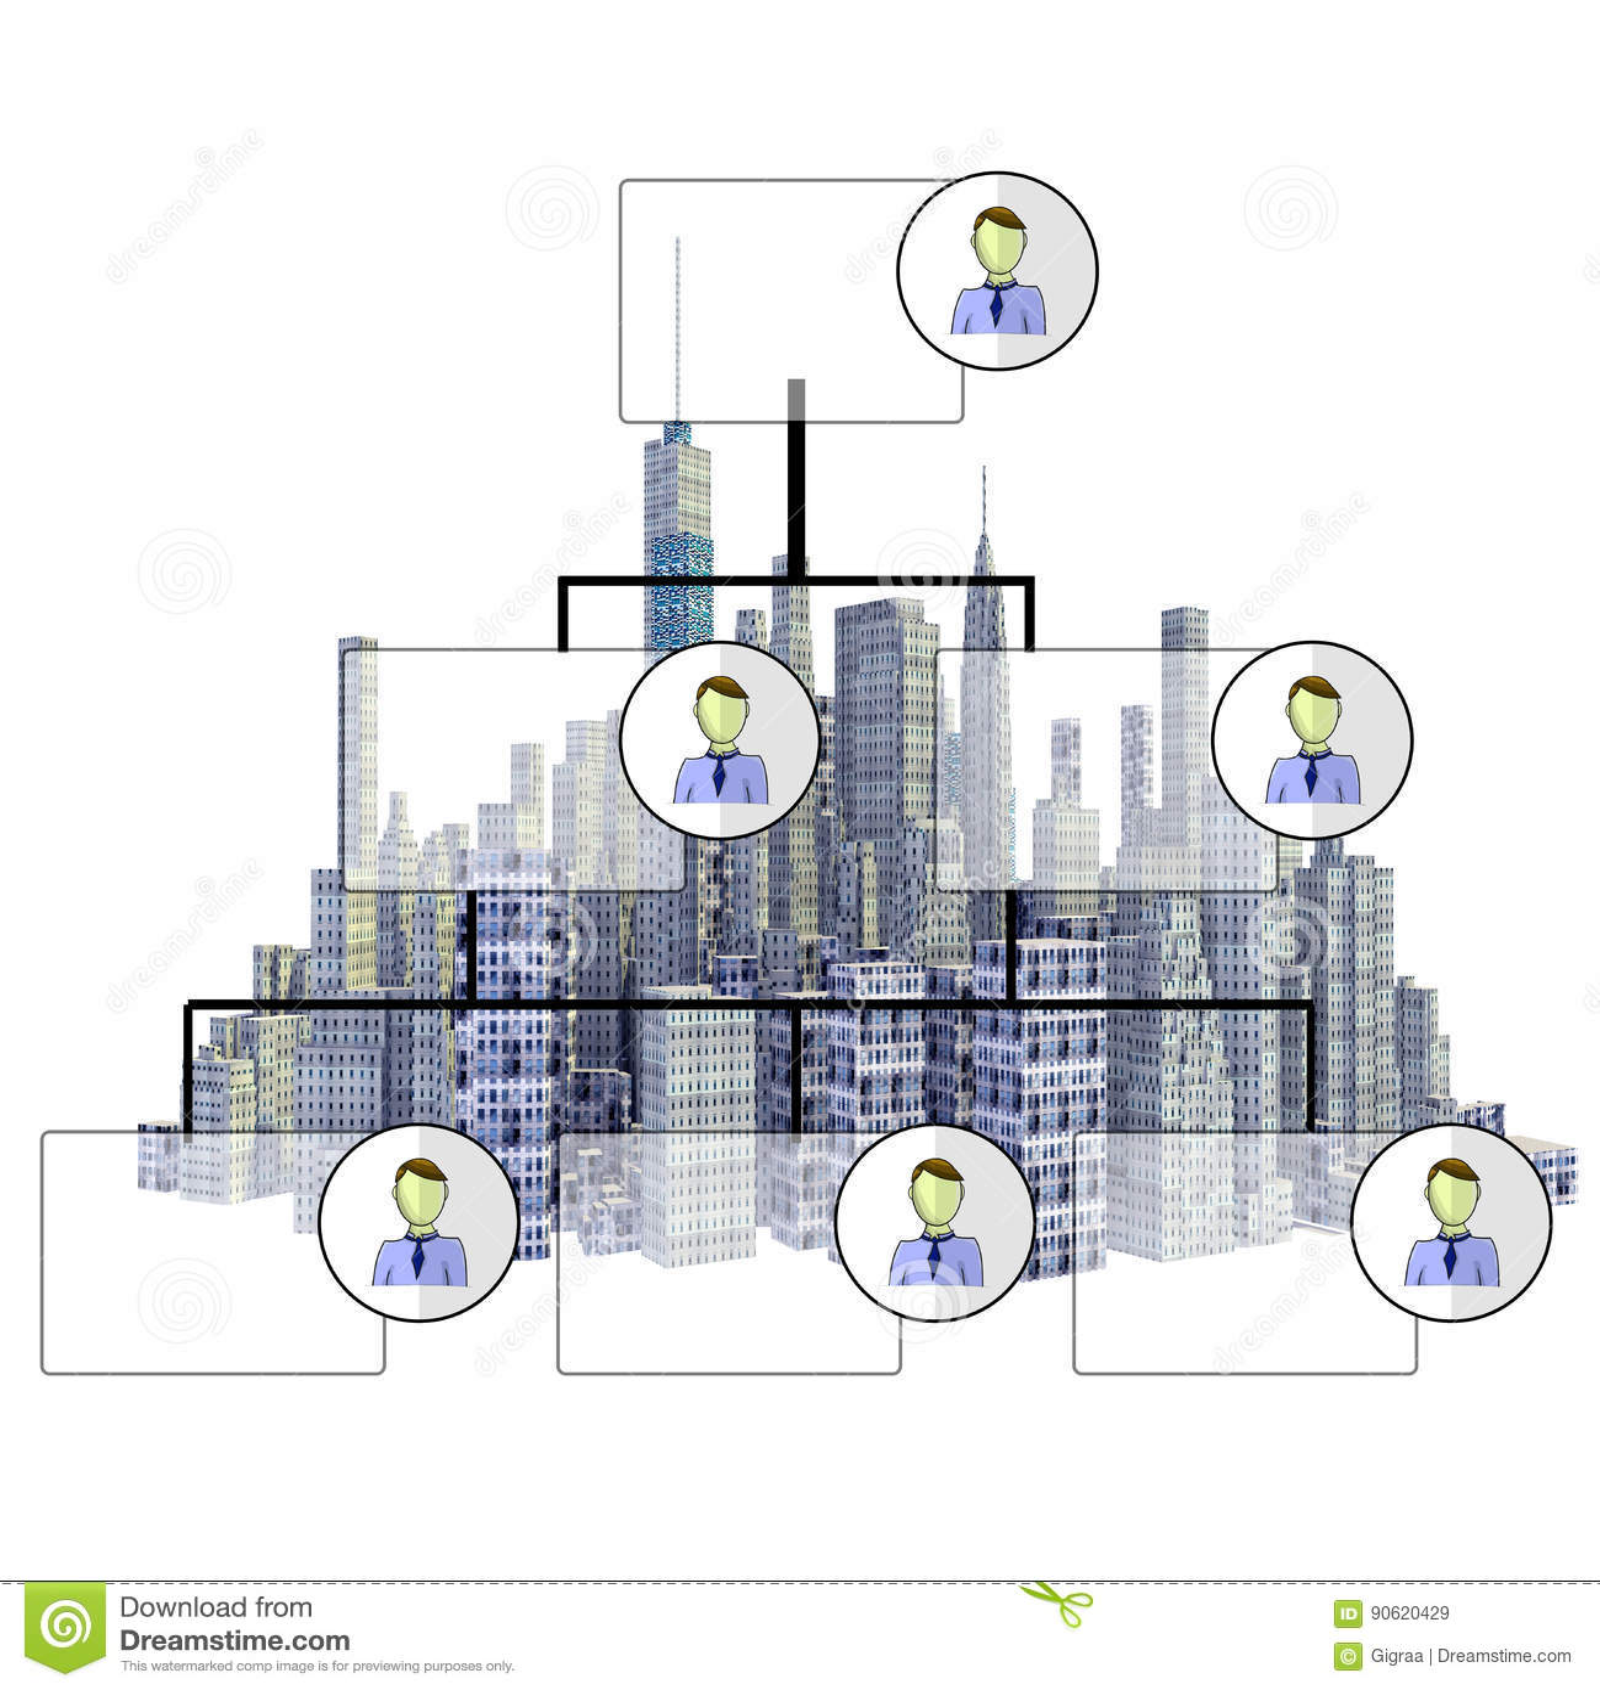 Rendered 3d city skyline with organigram